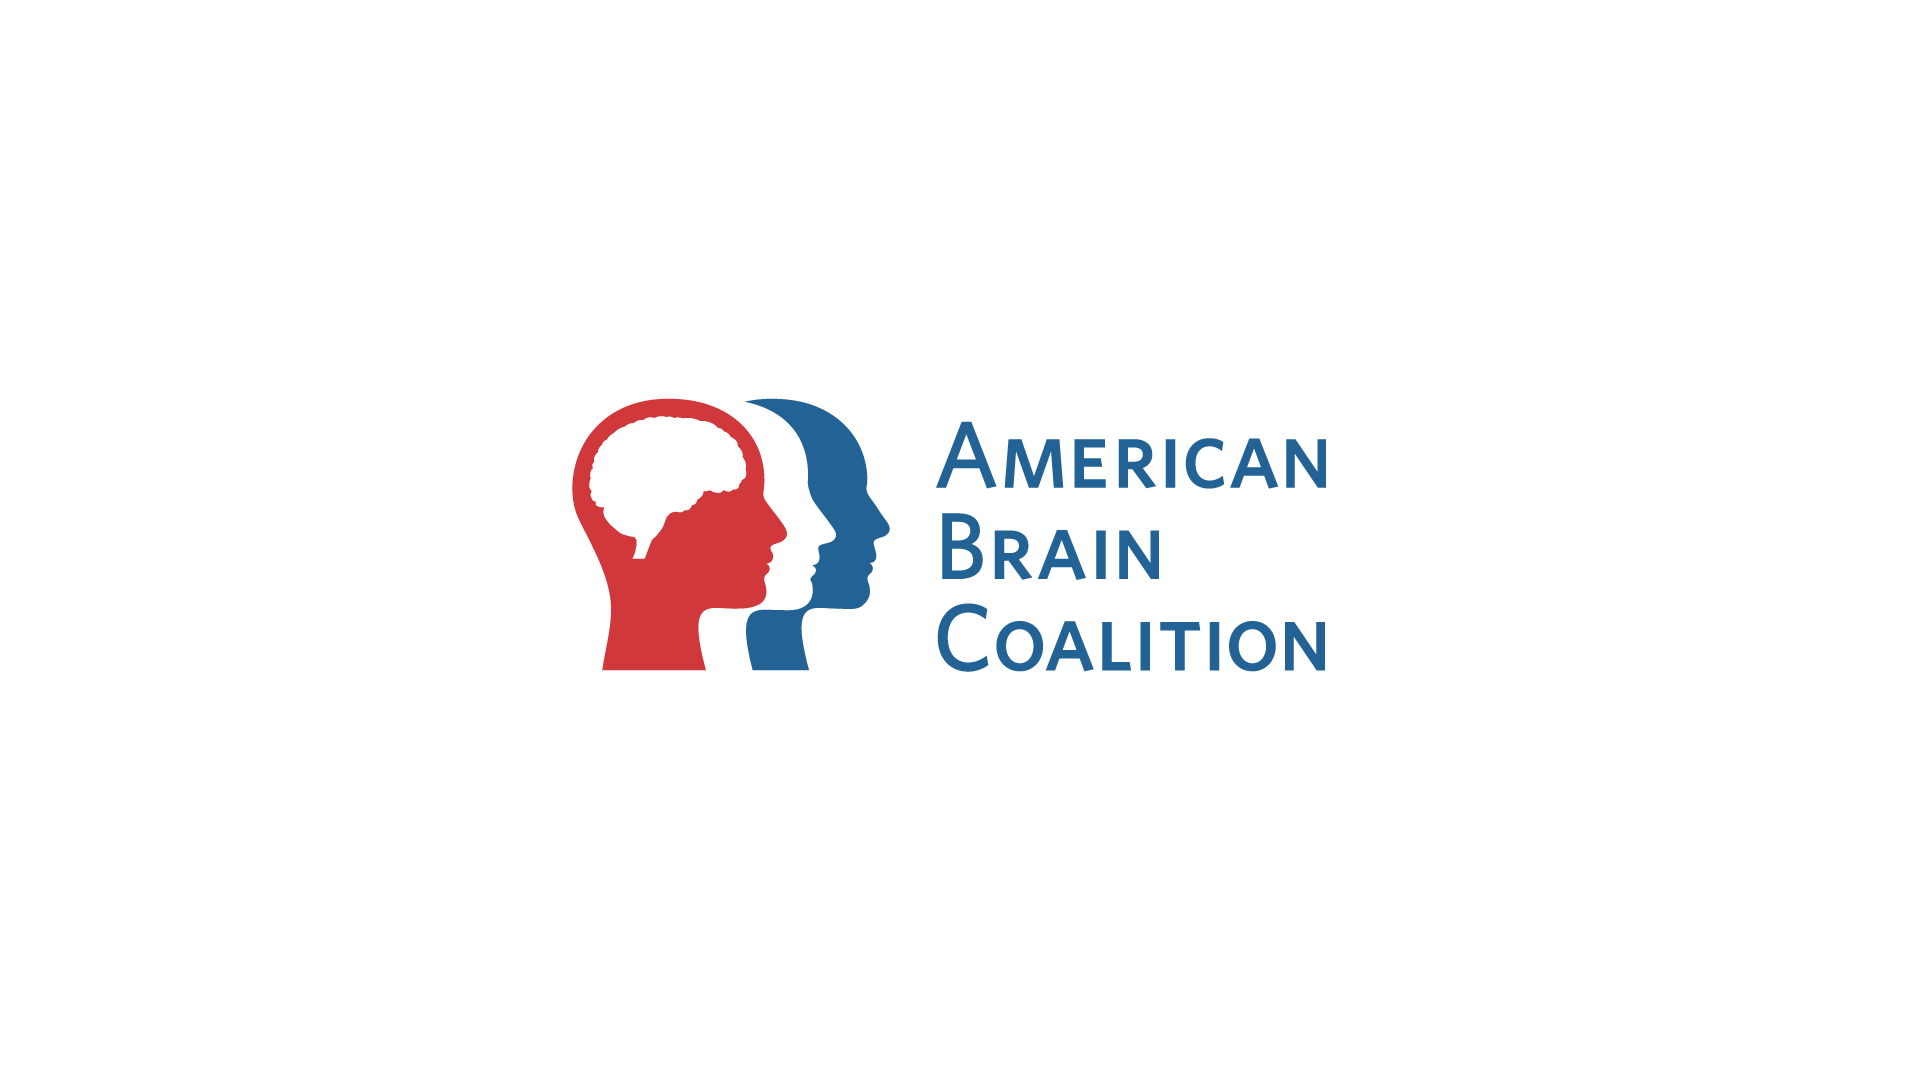 American Brain Coalition.png